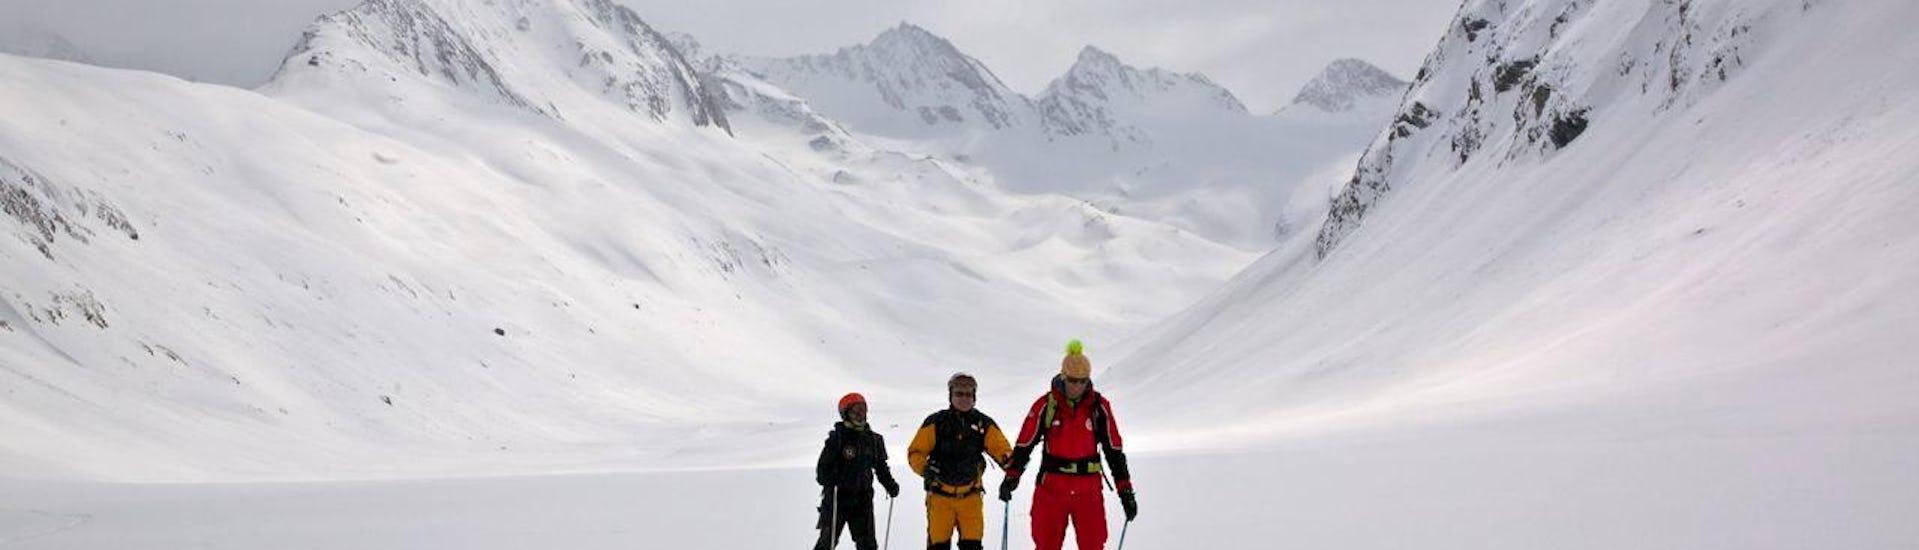 Ski Touring Guide - Beginners